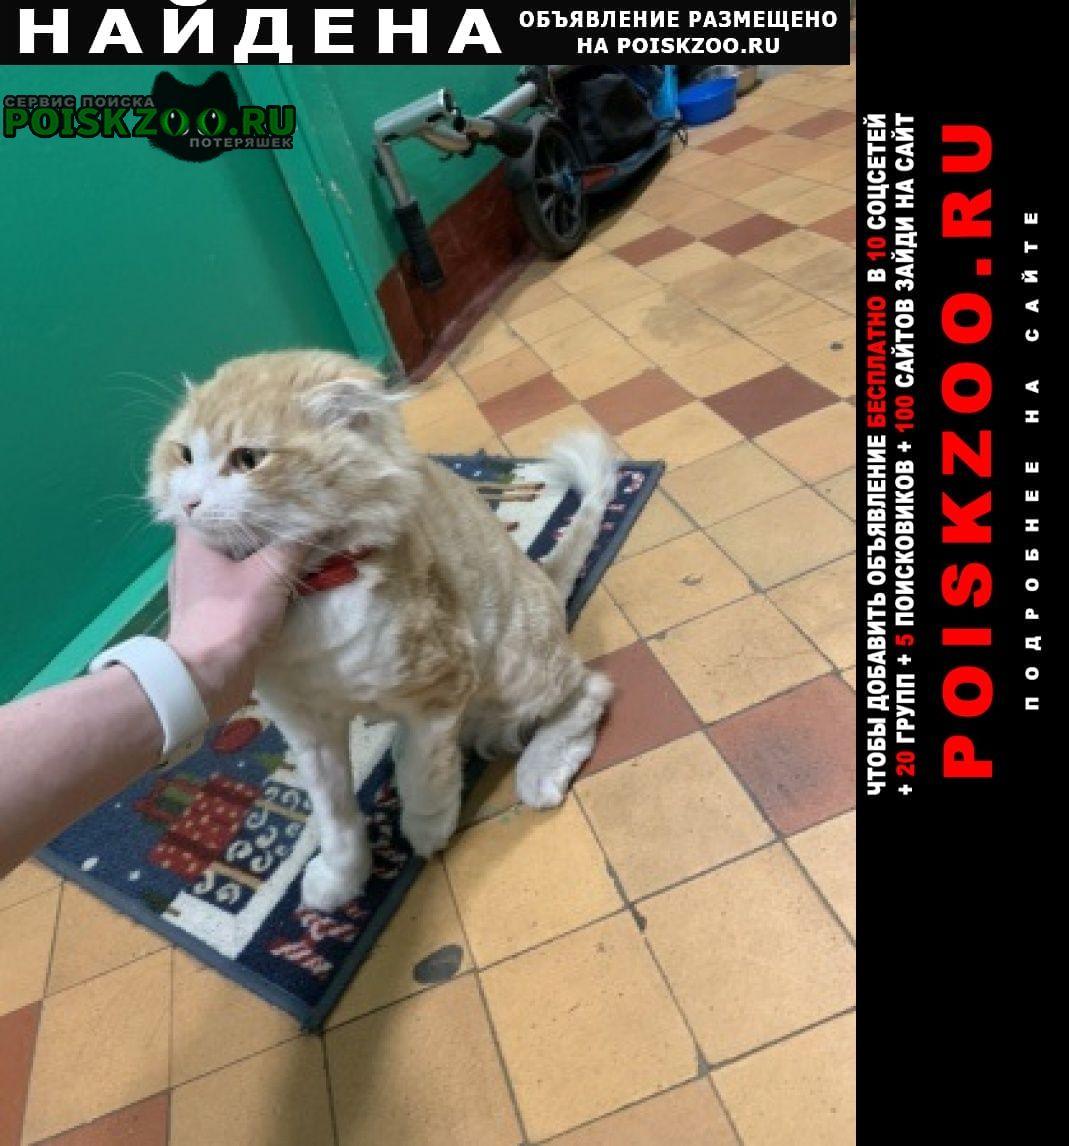 Найден кот вислоухий ювао рыжий Москва